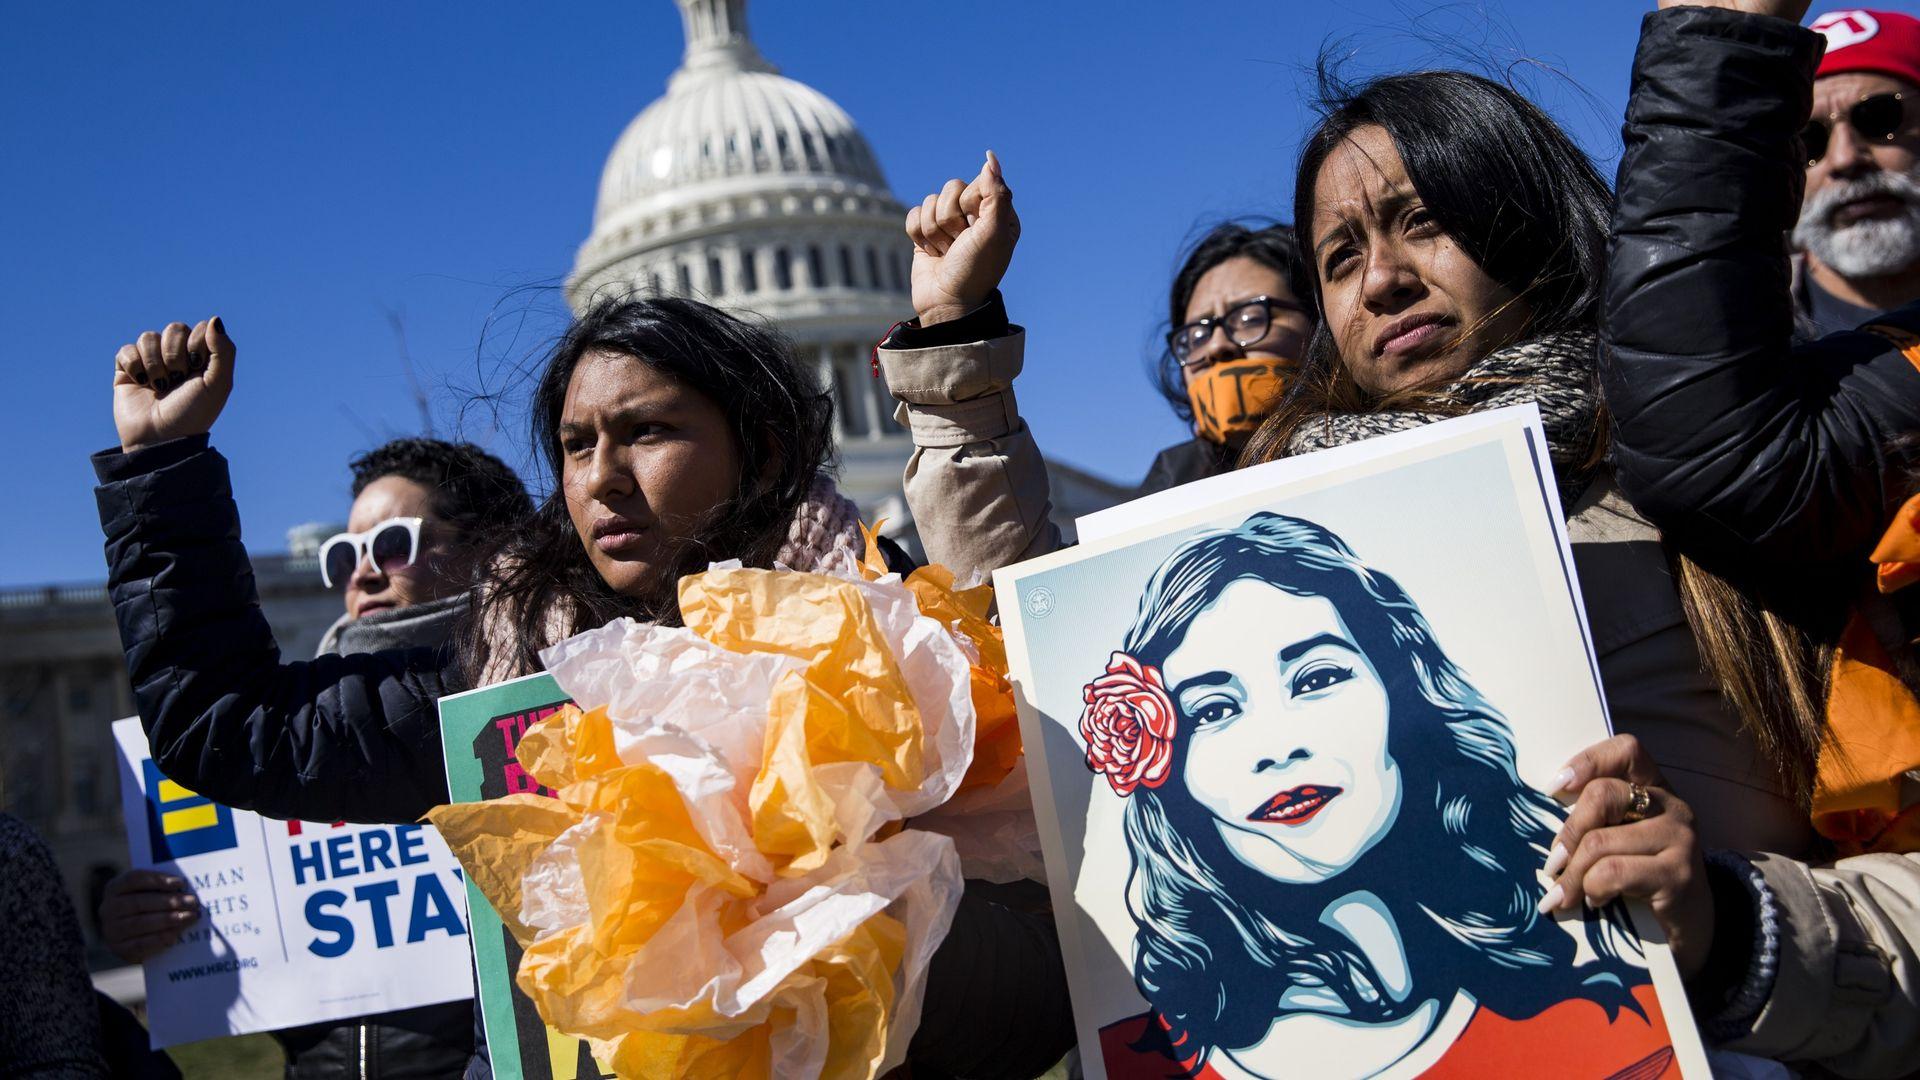 DACA protestors raise right fists